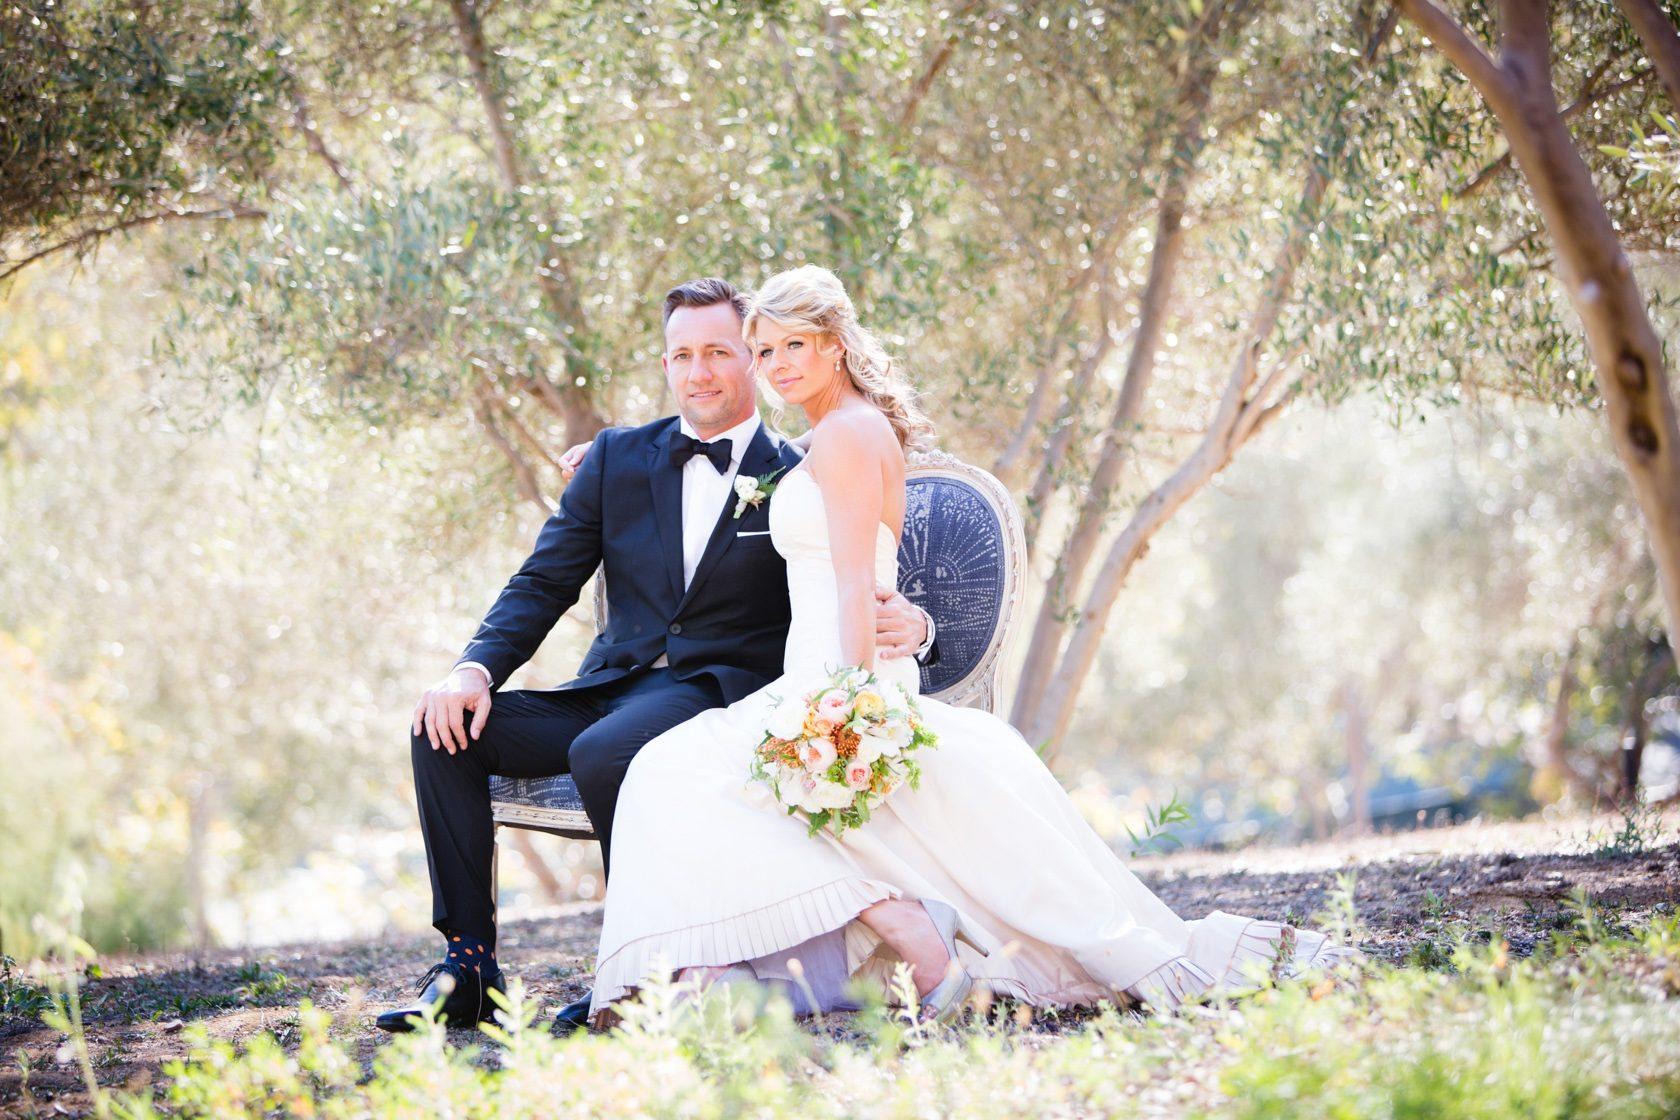 Rancho_Valencia_Resort_Wedding_036-1680x1120.jpg